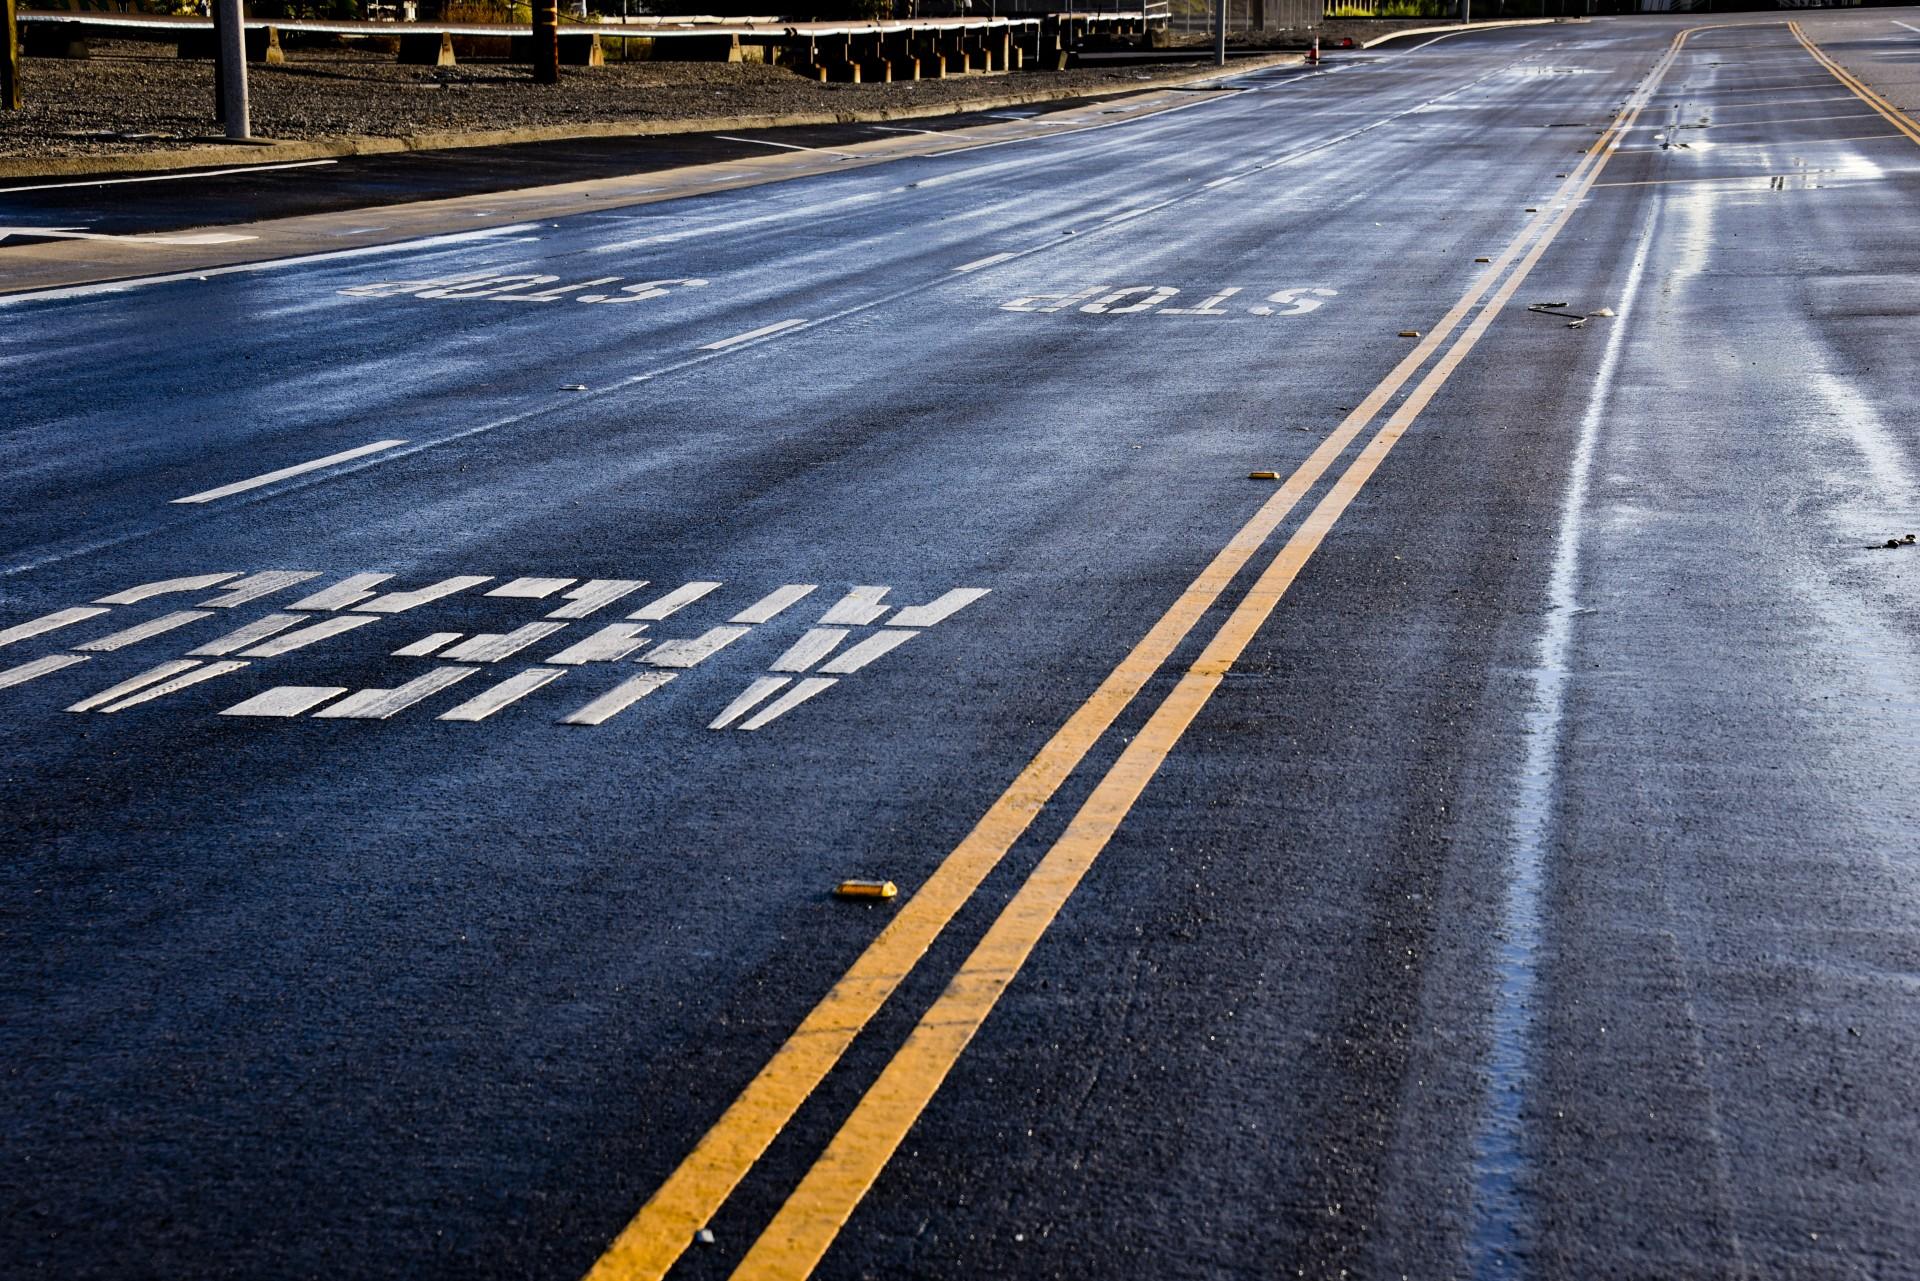 Asphalt,road,paint,sign,stop - free photo from needpix com